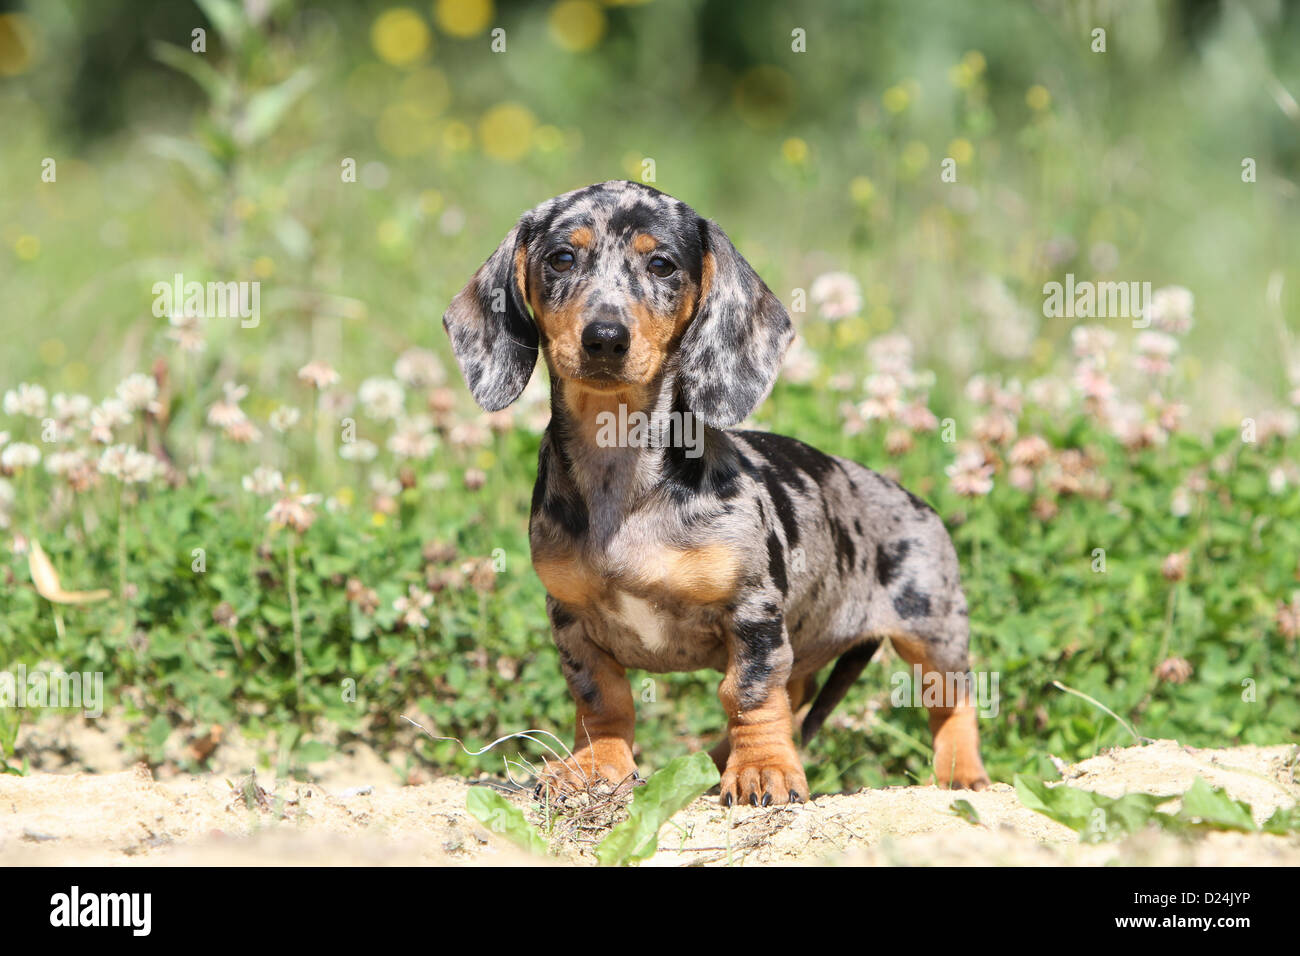 Dog Dachshund Dackel Teckel Shorthaired Puppy